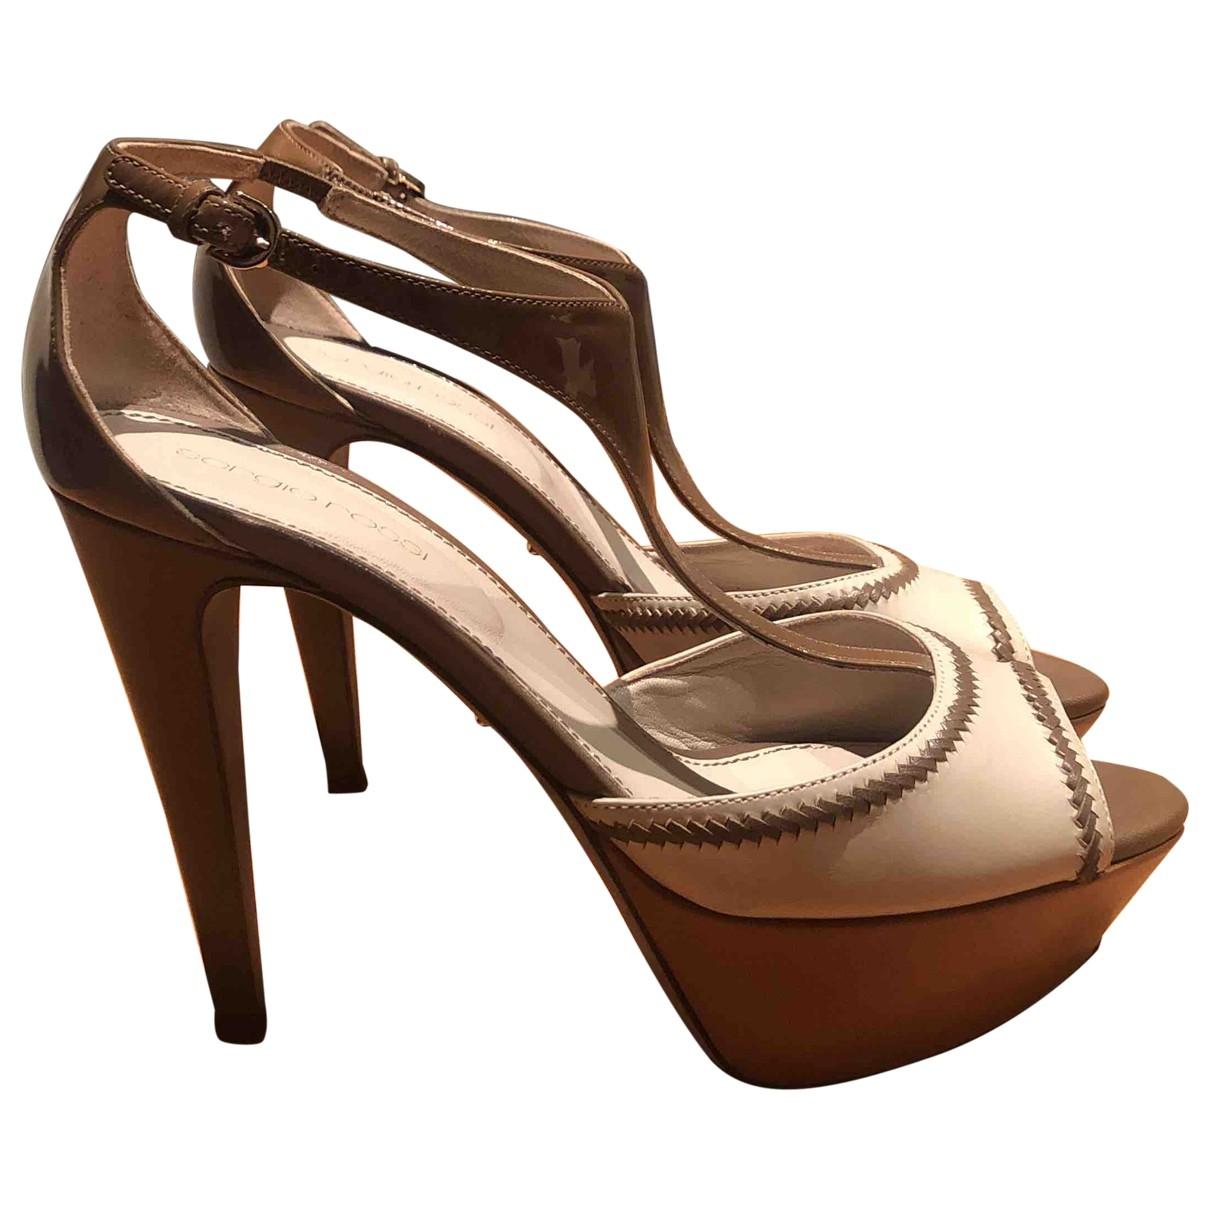 Sergio Rossi \N Beige Leather Sandals for Women 37 EU